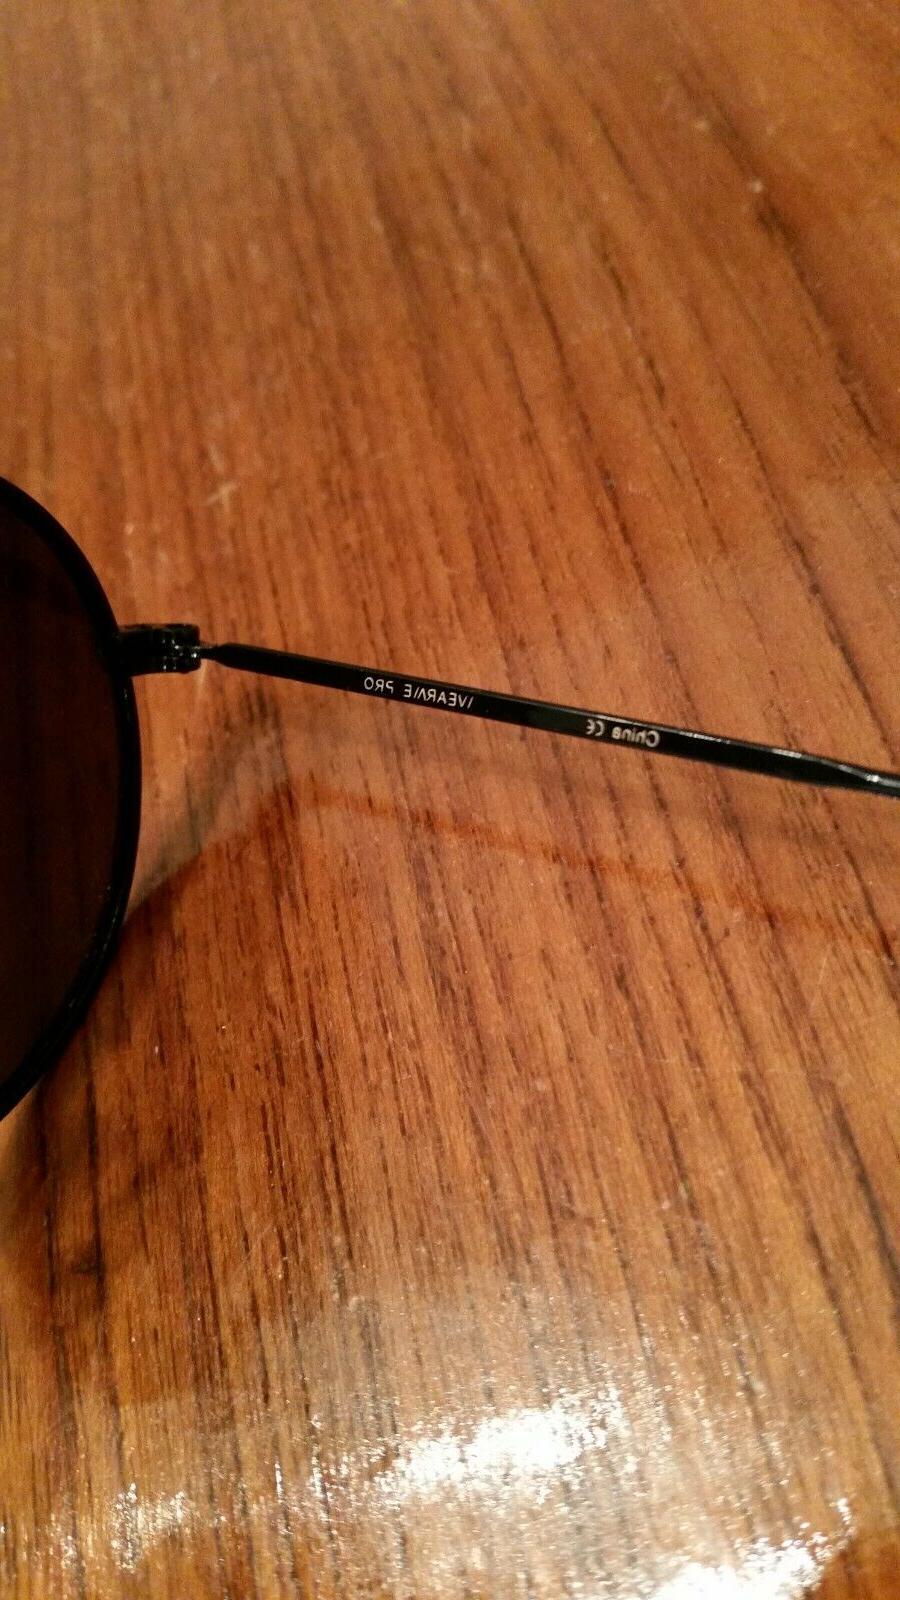 Wearme Pro polarized sunglasses,